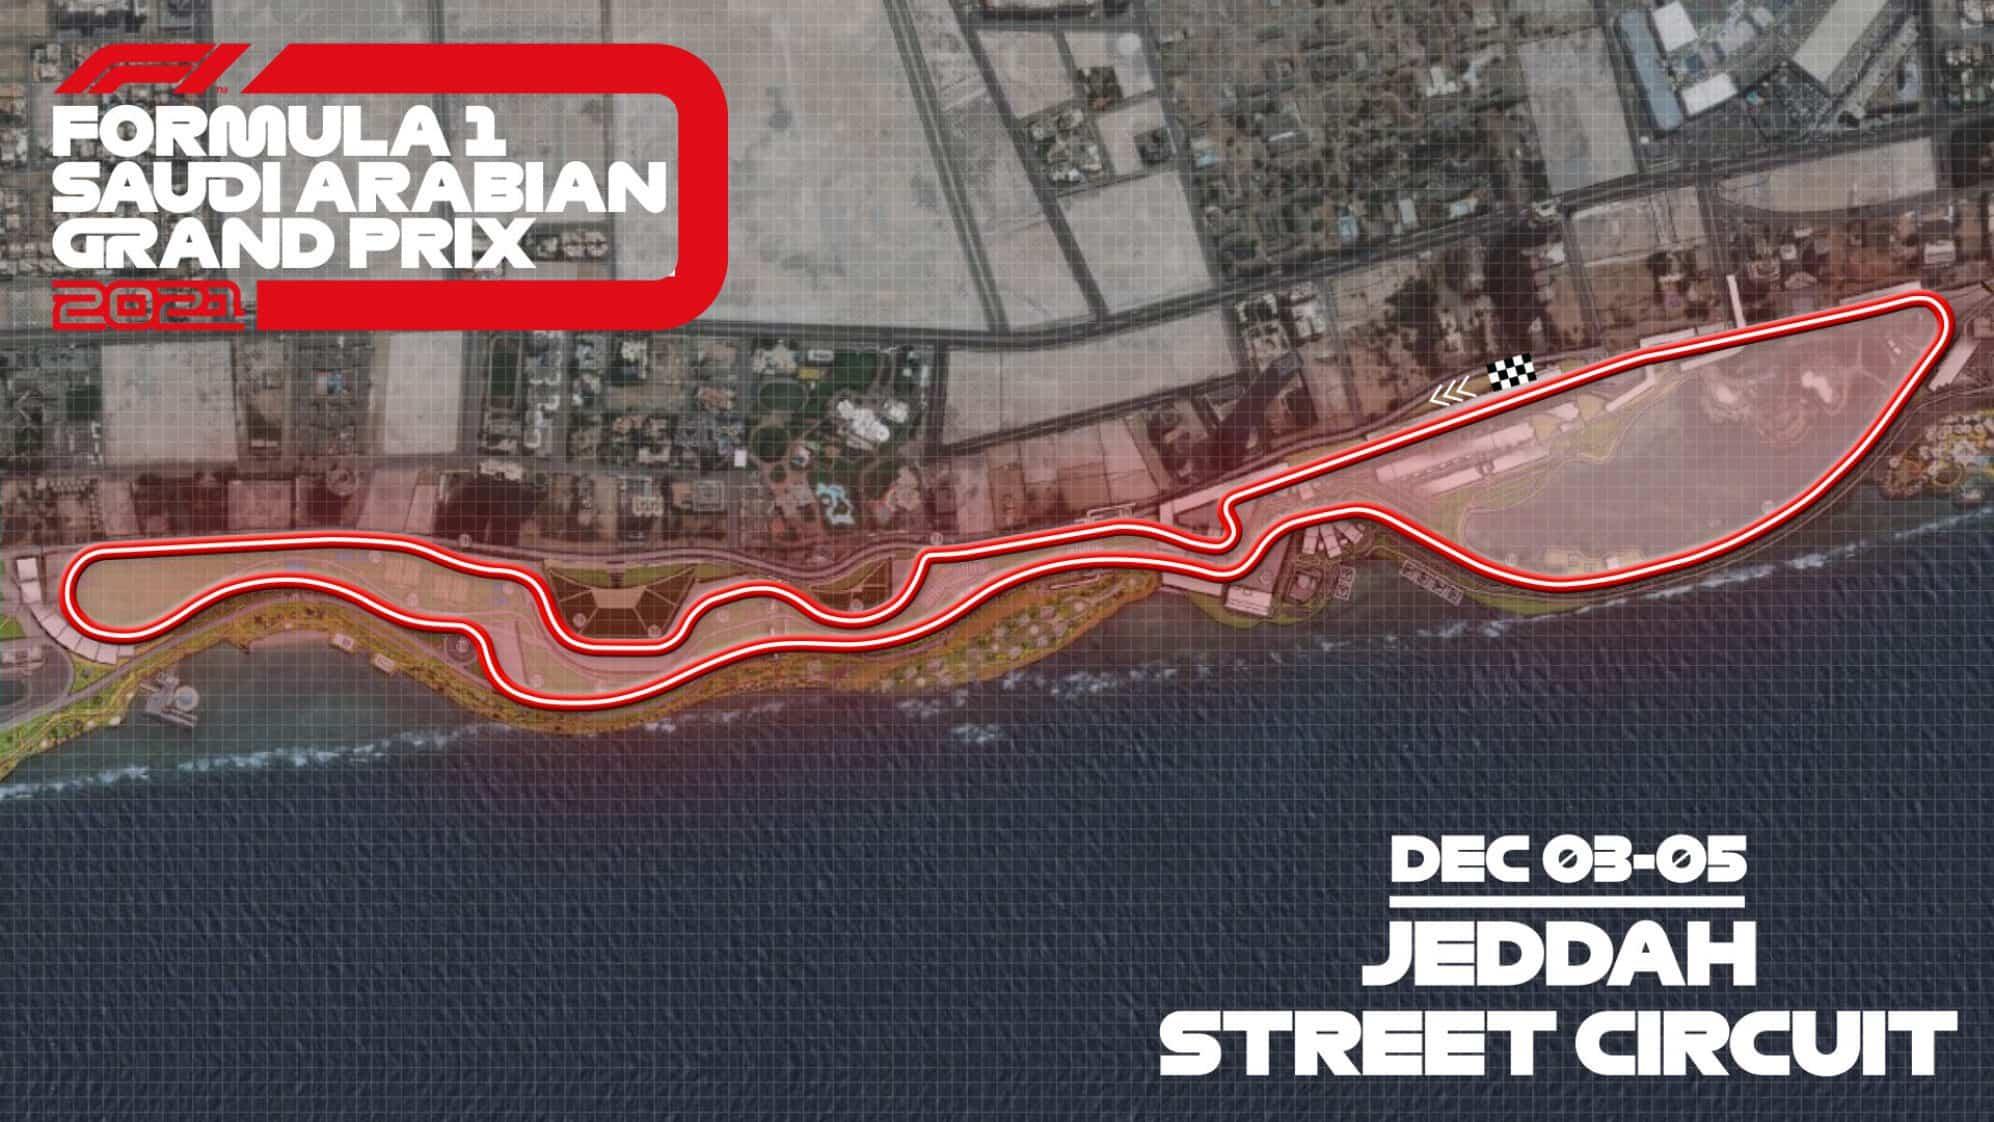 Jeddah Street Circuit Dec 03-05 2021 Photo Formula 1 - com